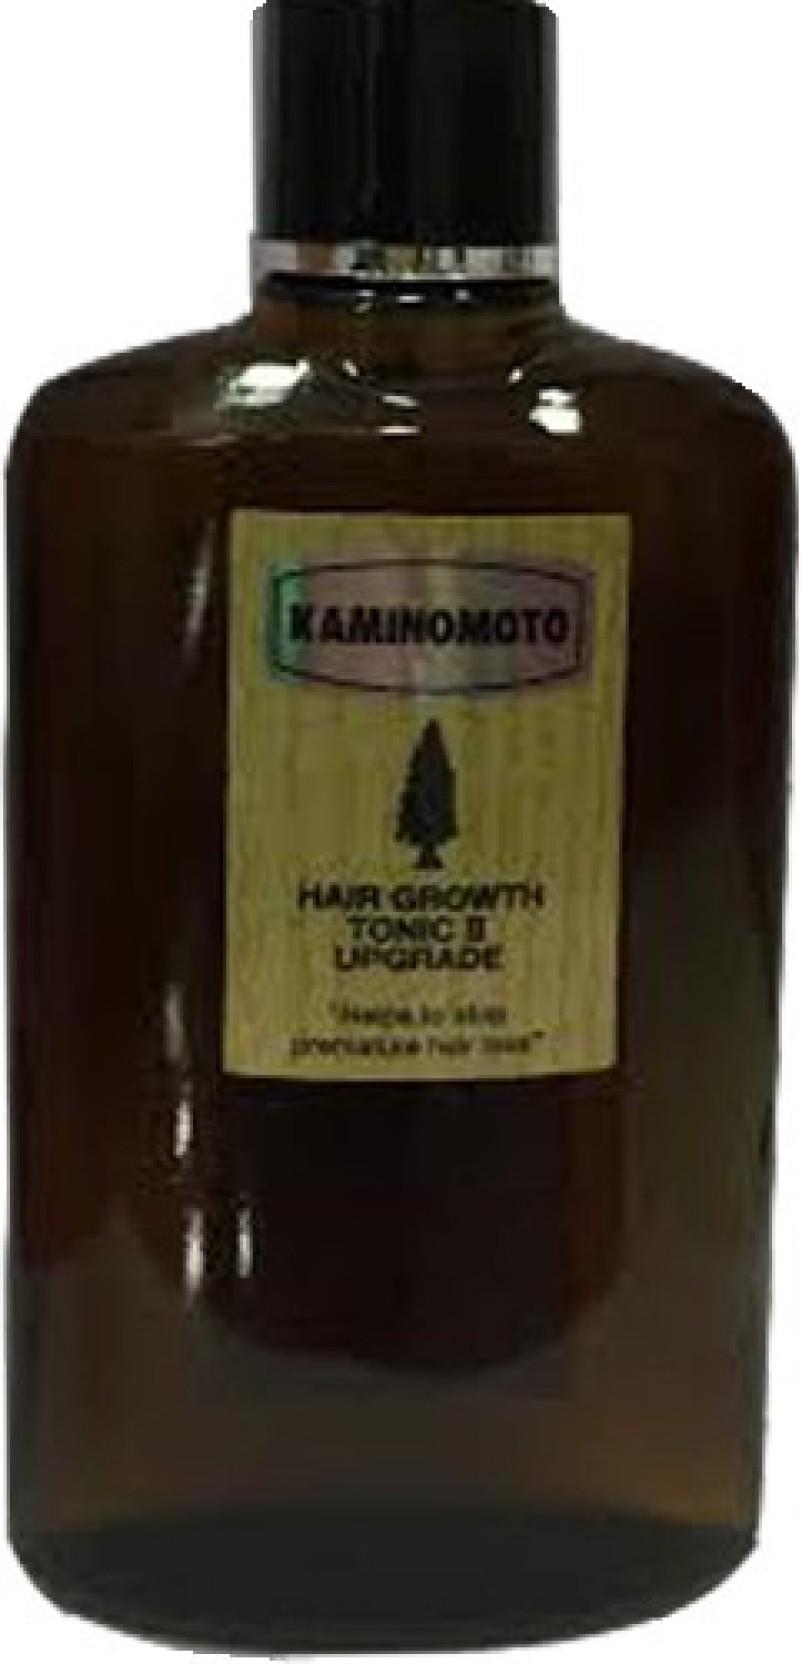 Kaminomoto Hair Growth Tonic Oil Price In India Buy Accelerator 150ml Home